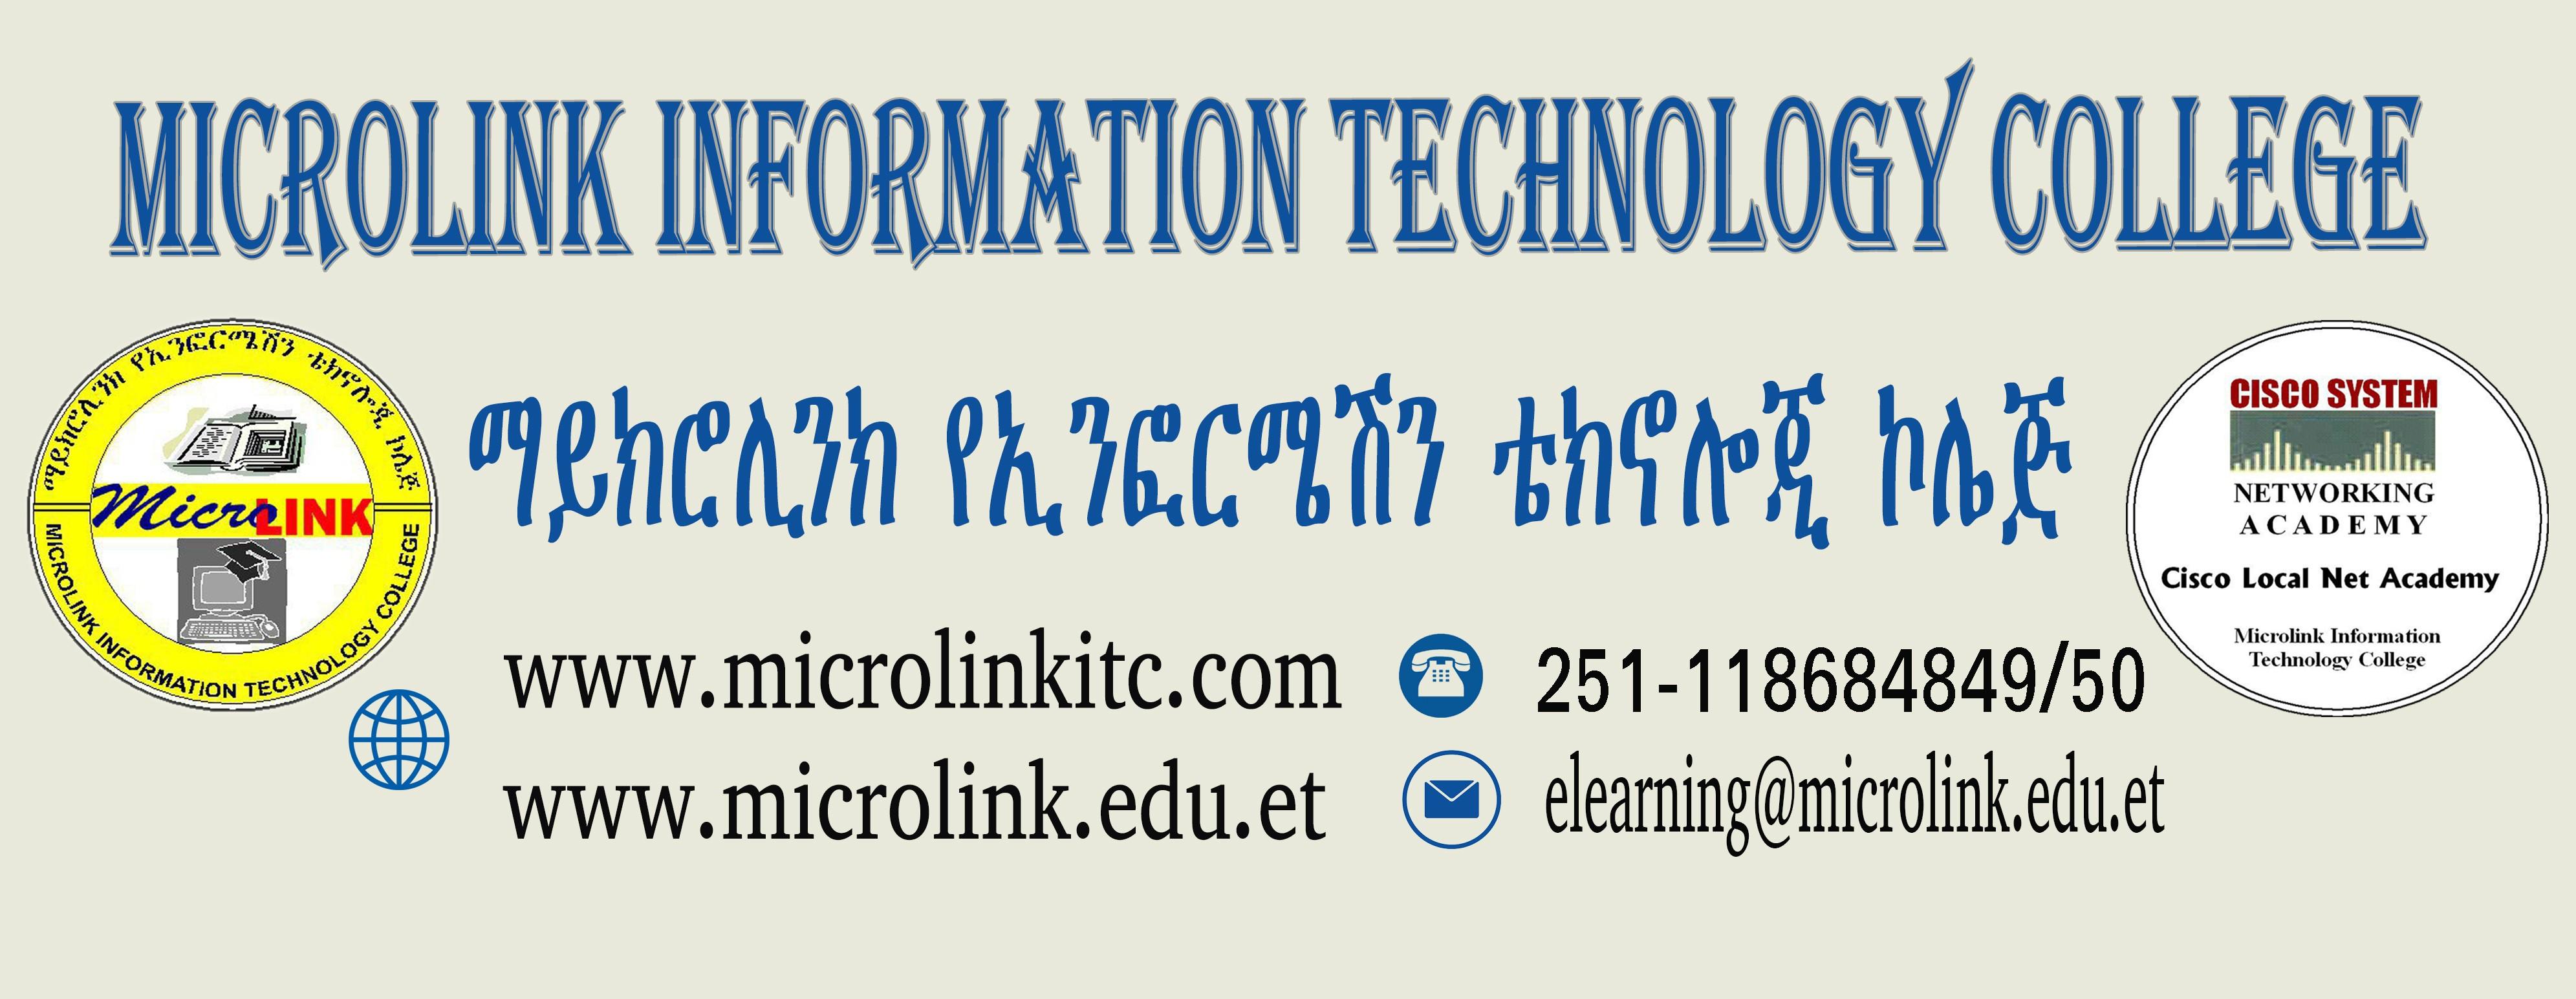 Microlink Information Technology College Linkedin